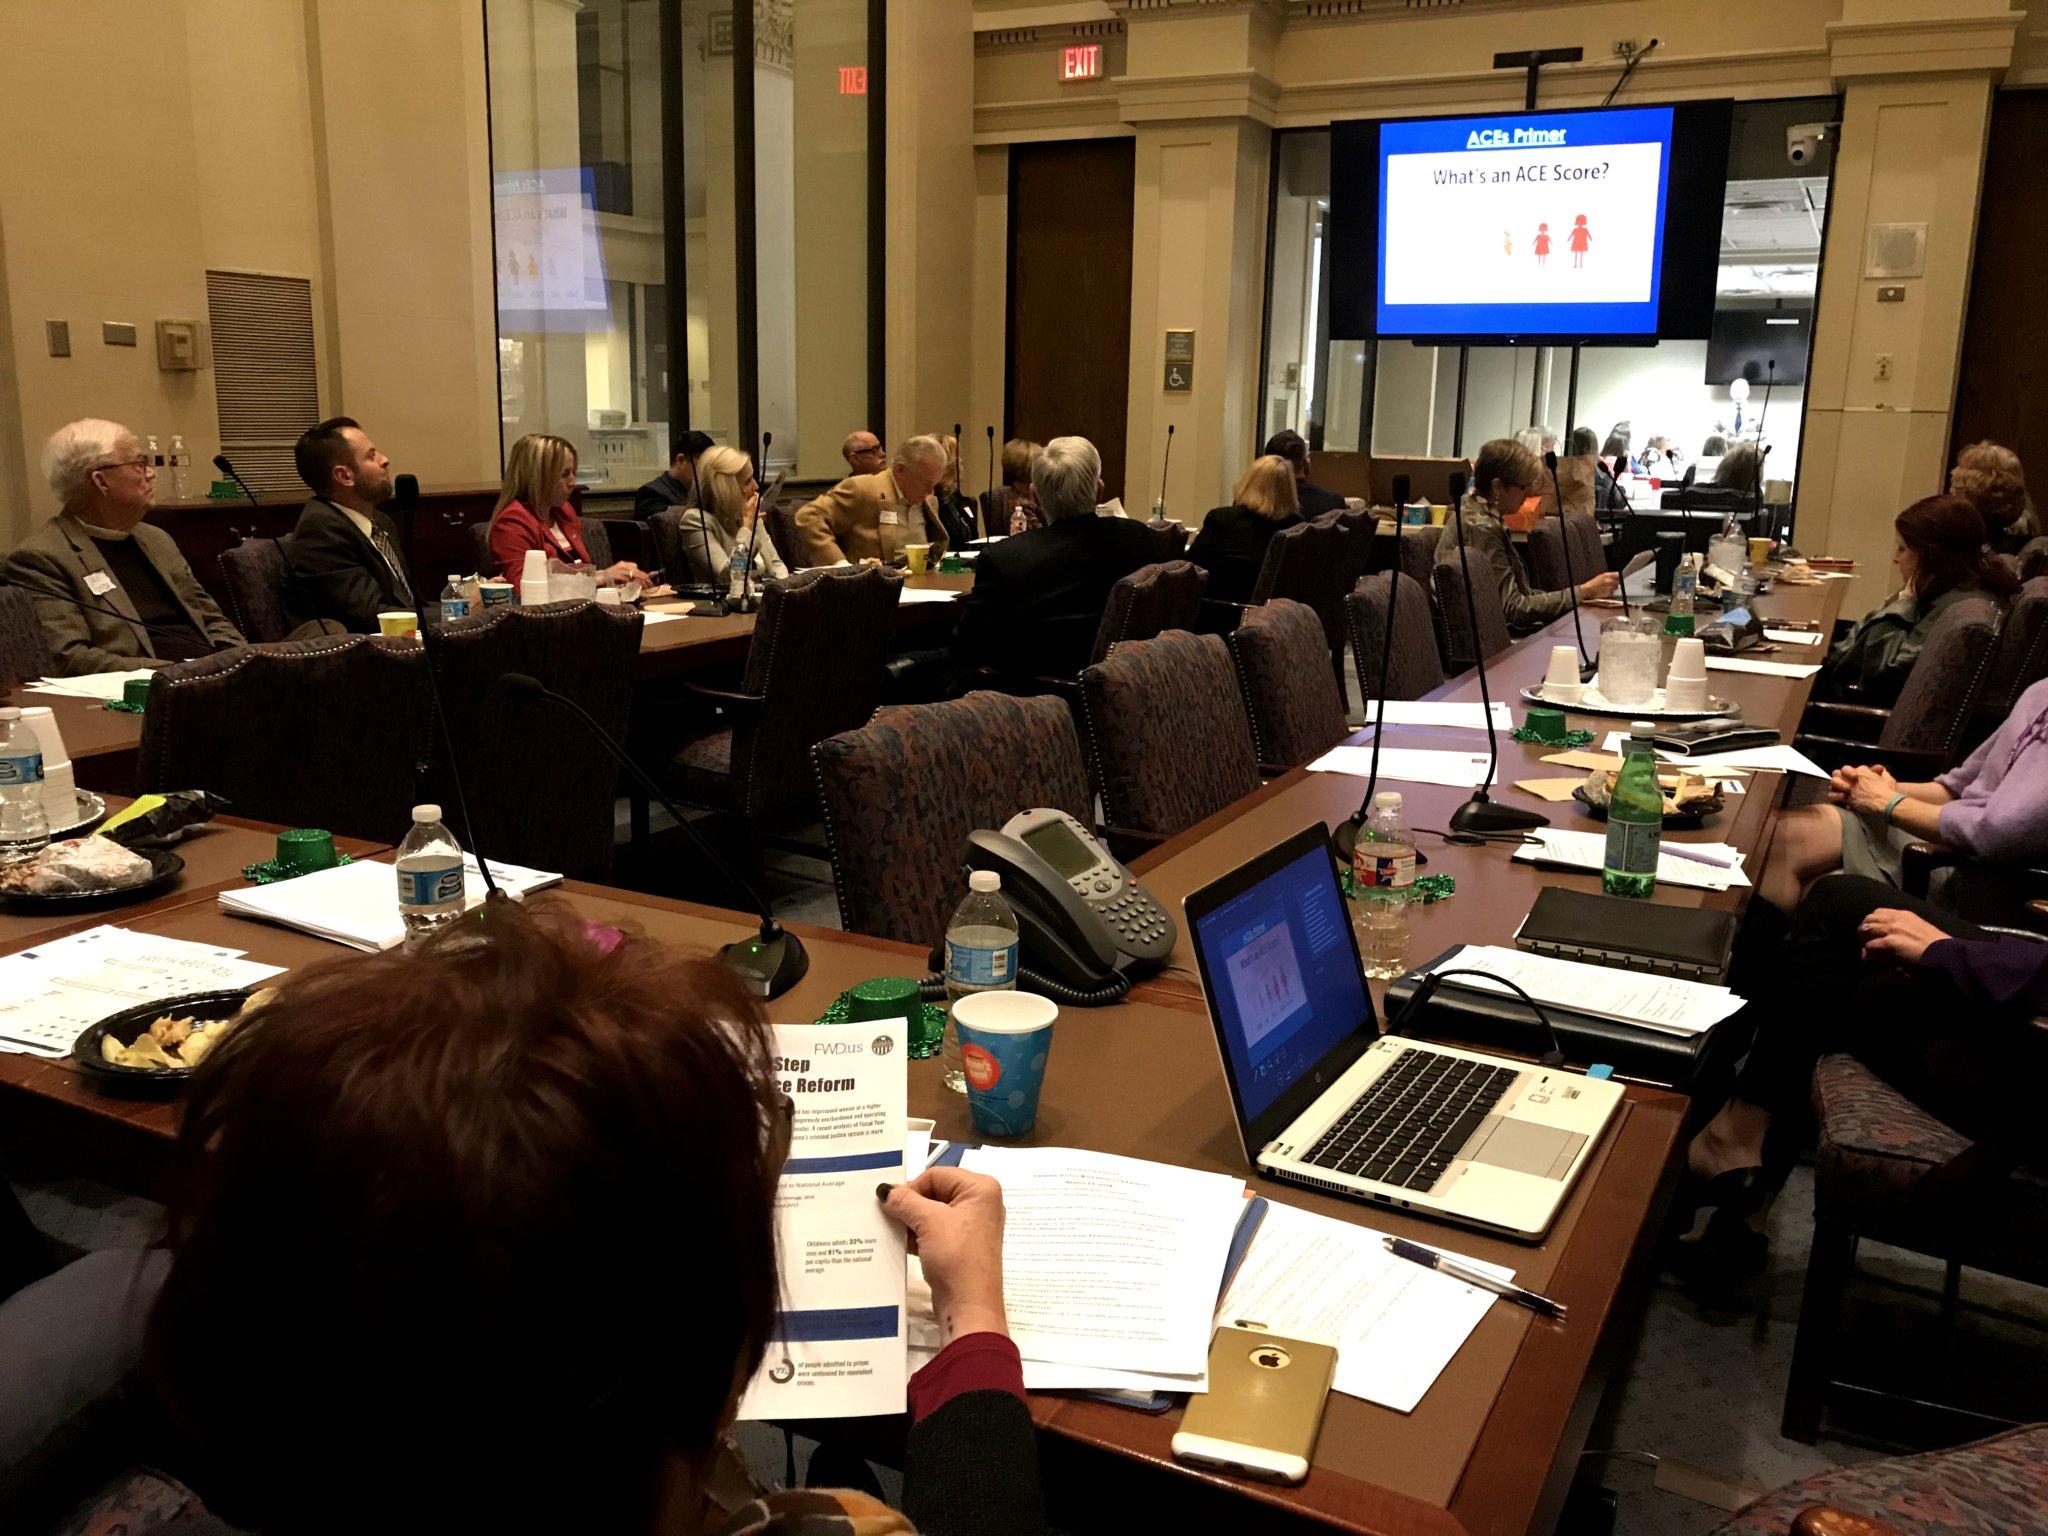 Presentation on ACEs for Early Childhood Legislative Caucus. Photo courtesy of Linda Manaugh.